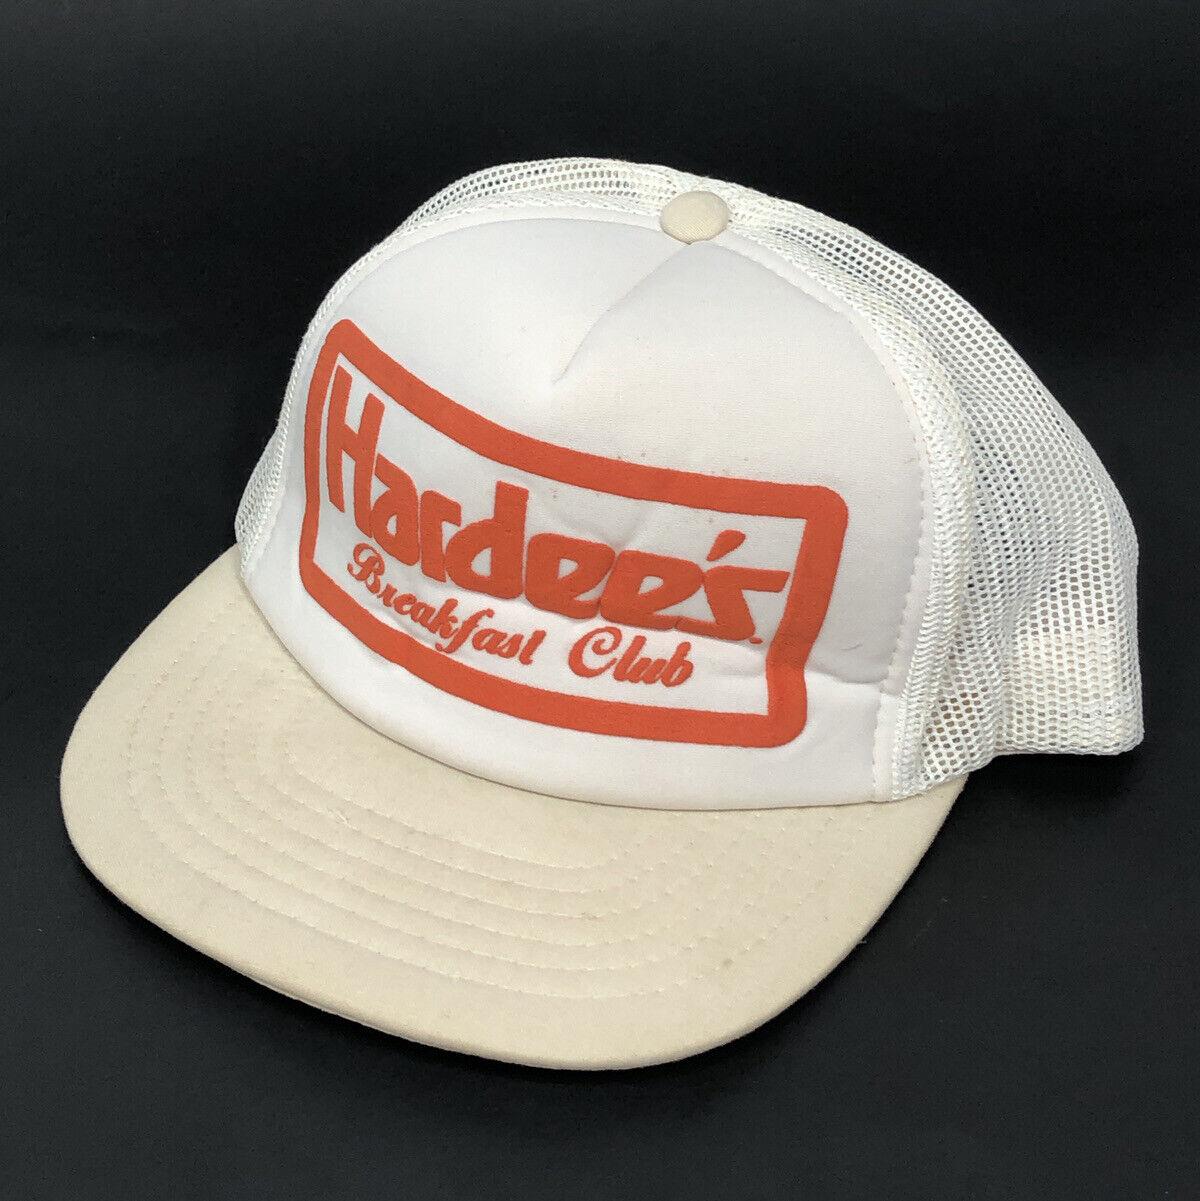 Vintage Trucker Hat Hardees Breakfast Club Mesh snapback cap Food Uniform YY